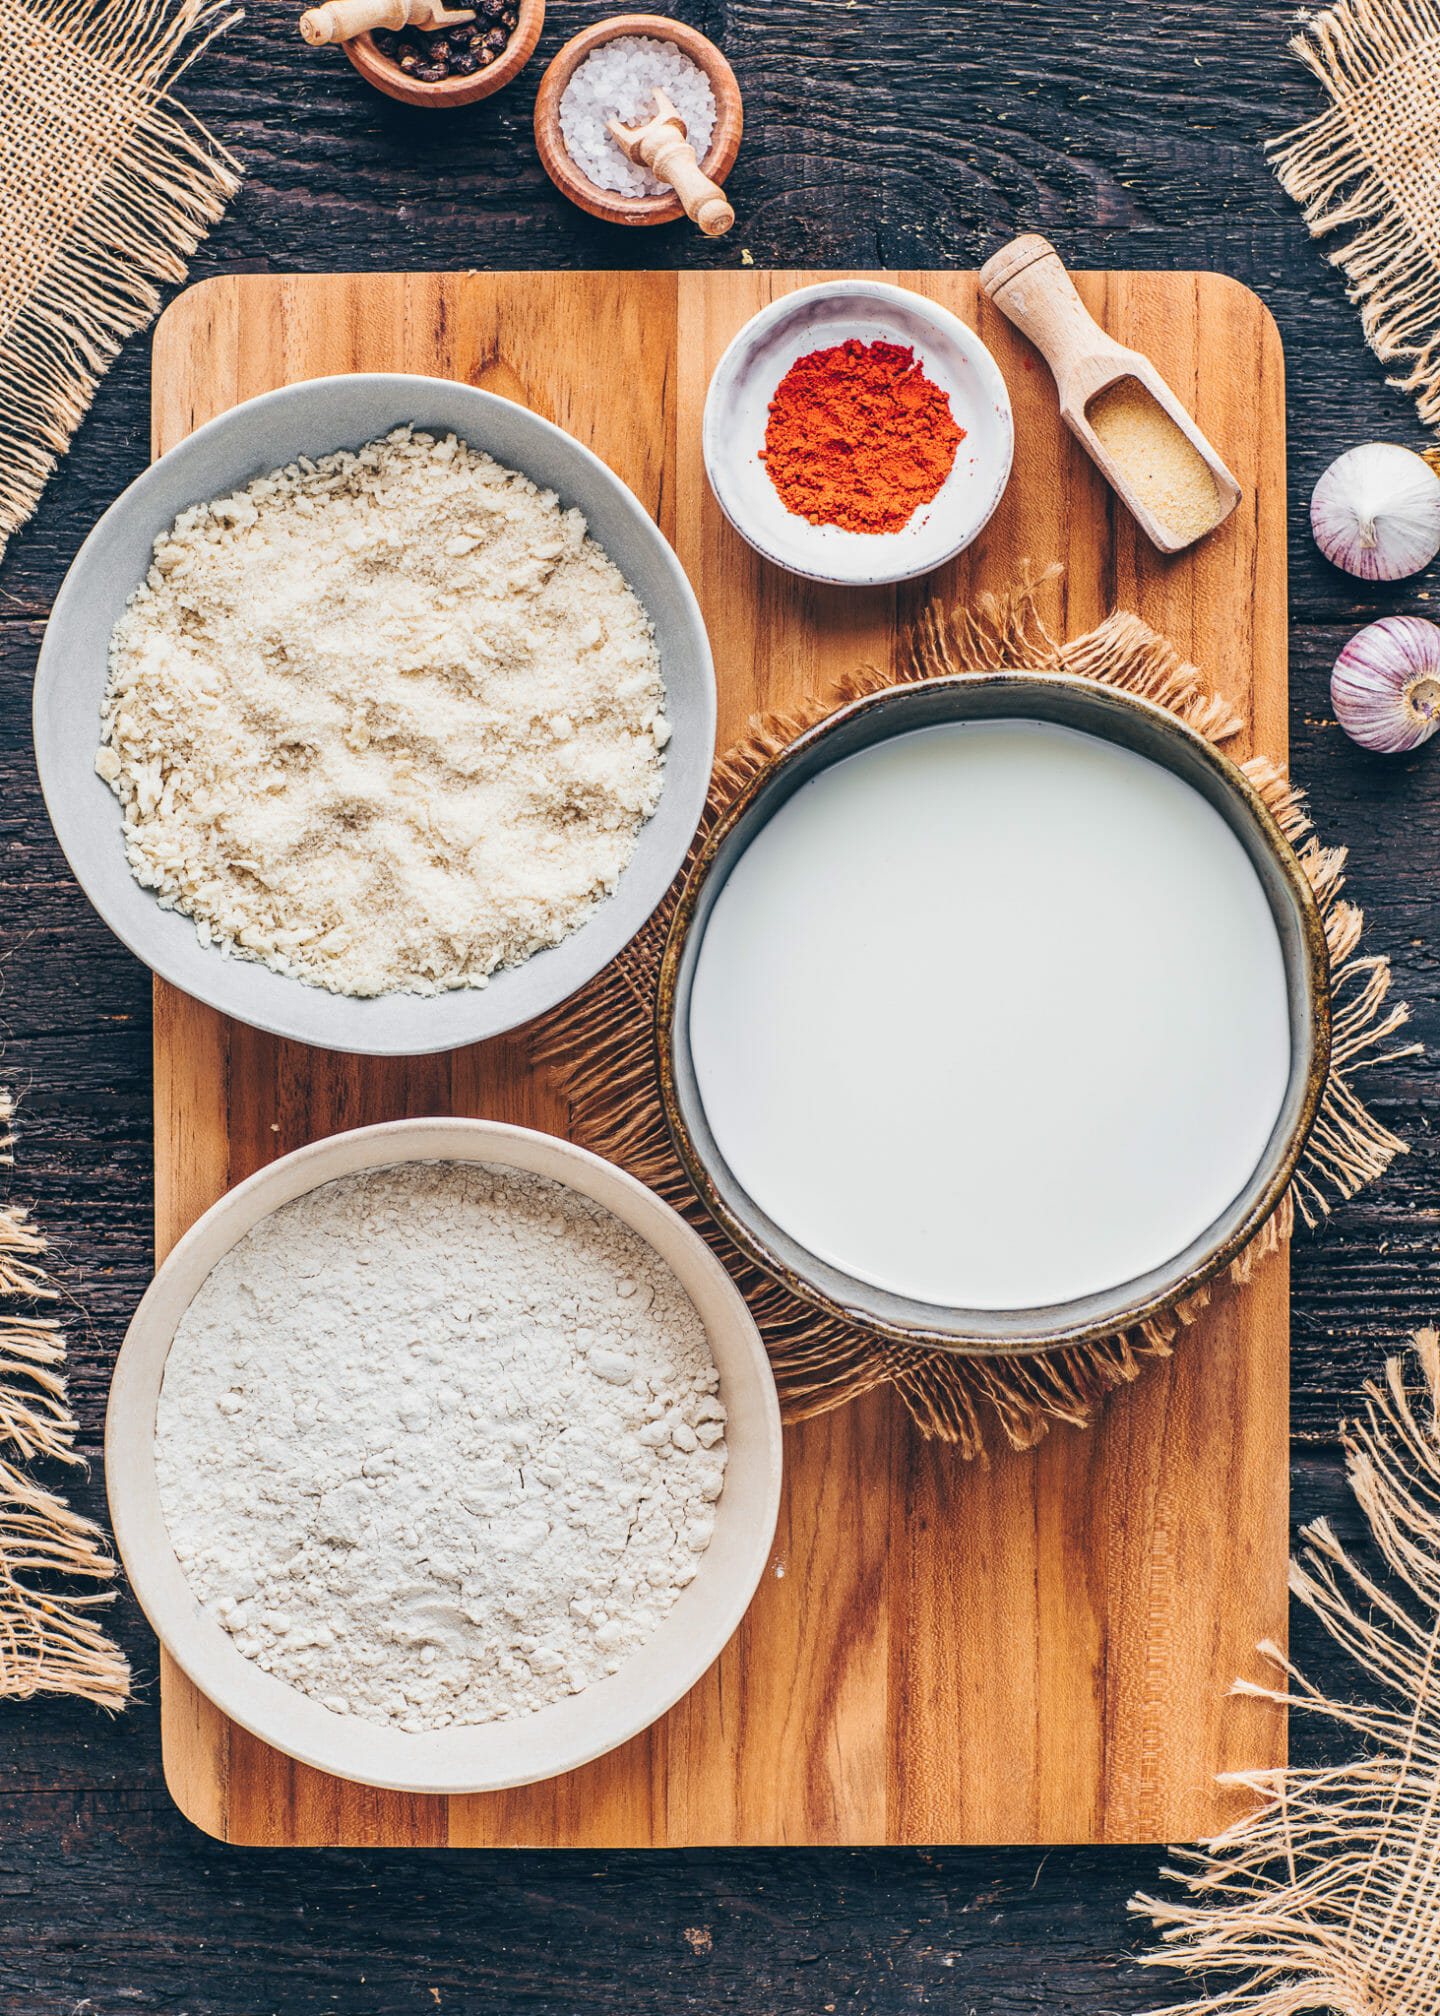 breadcrumb coating for baked vegan potato croquettes